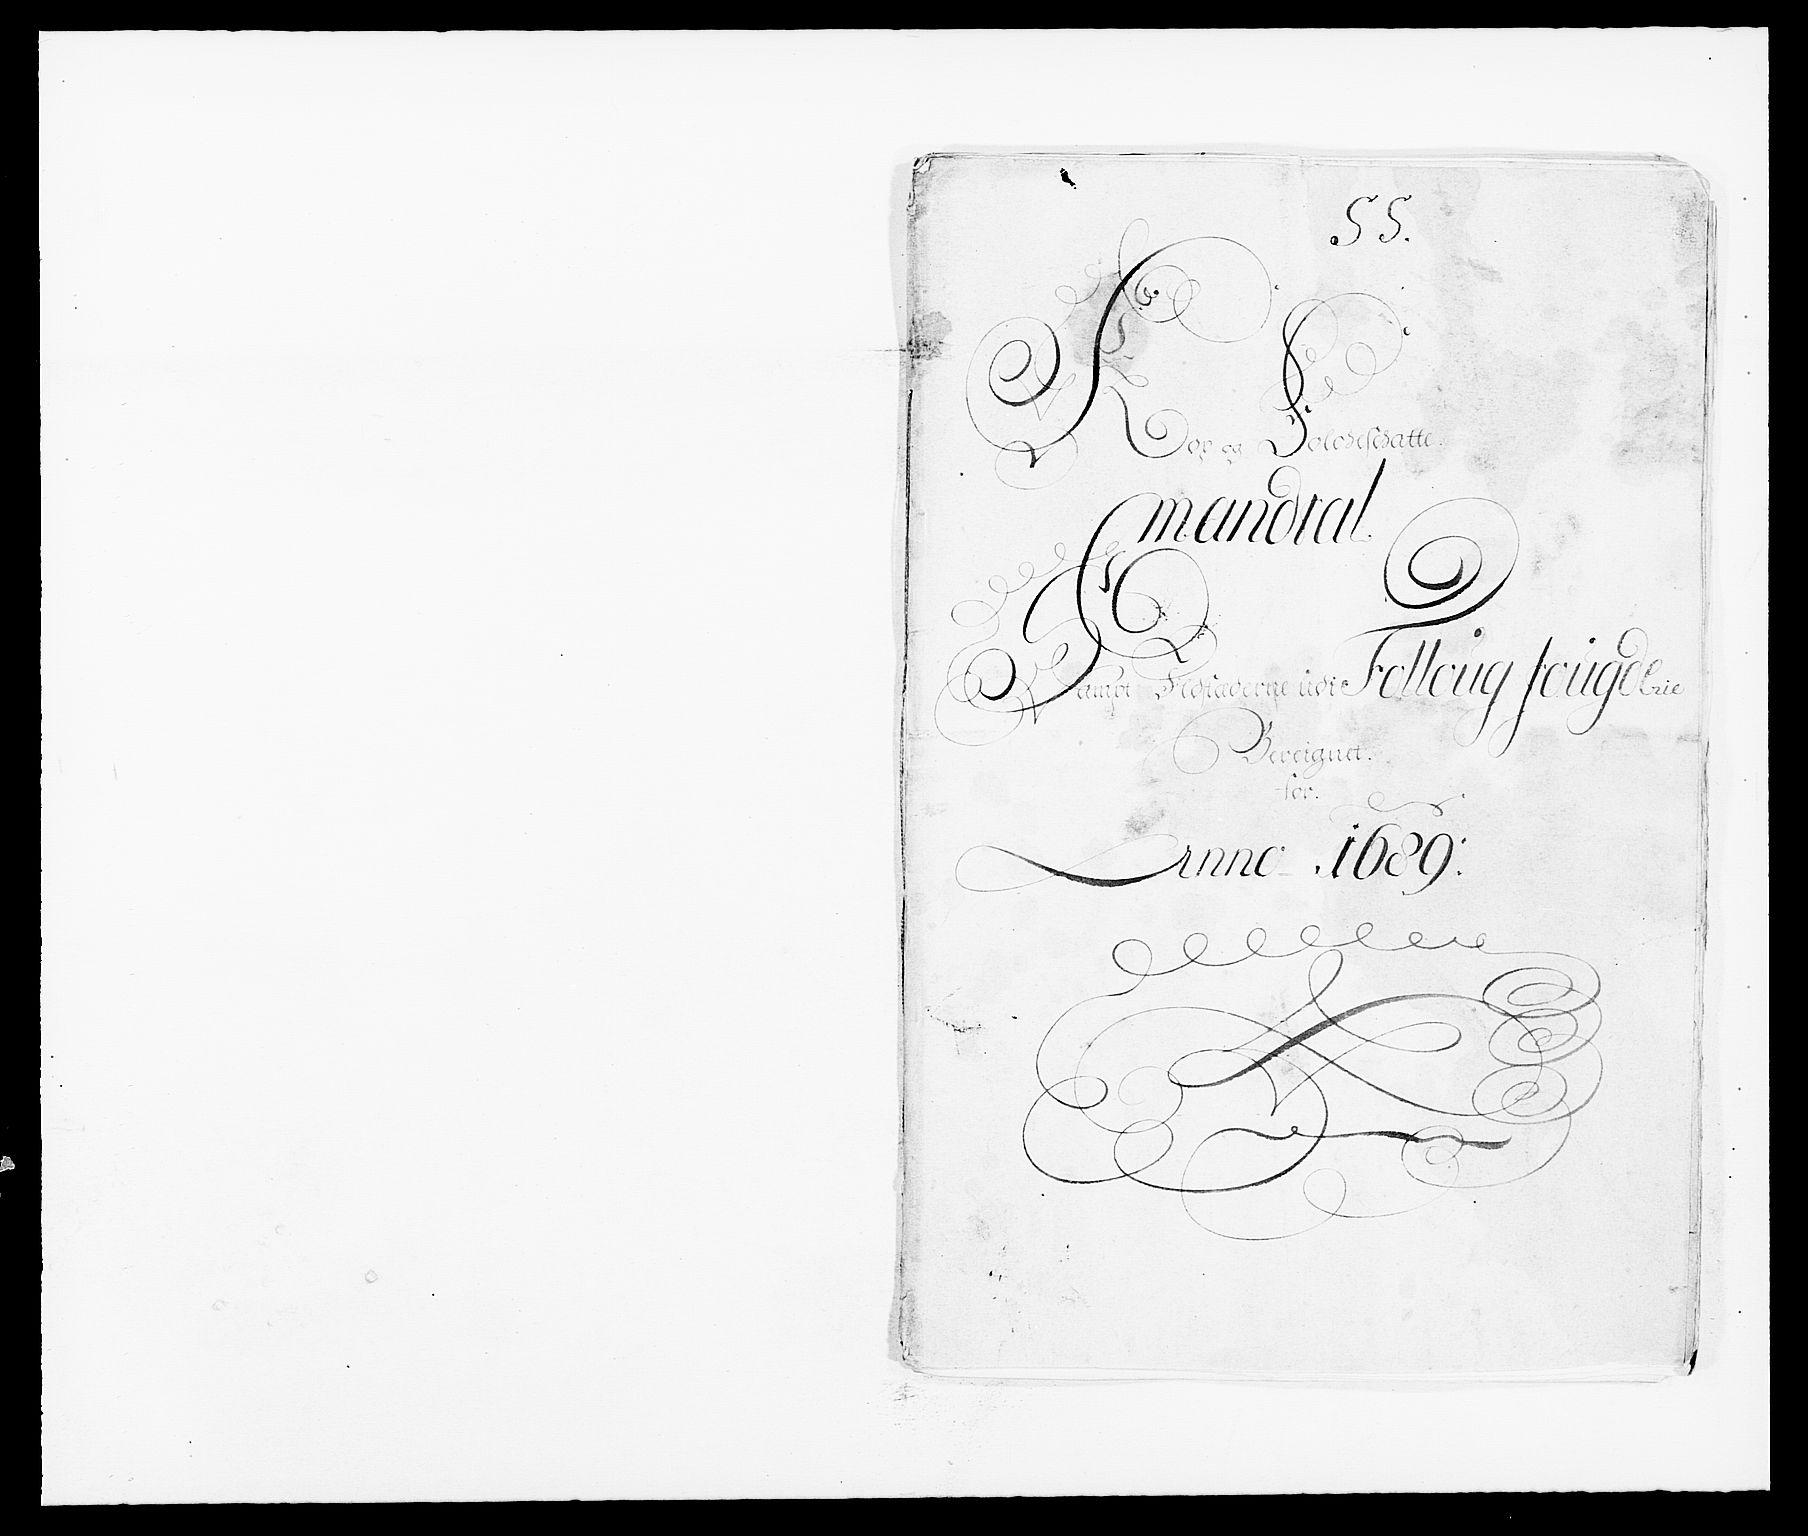 RA, Rentekammeret inntil 1814, Reviderte regnskaper, Fogderegnskap, R09/L0435: Fogderegnskap Follo, 1689-1691, s. 189